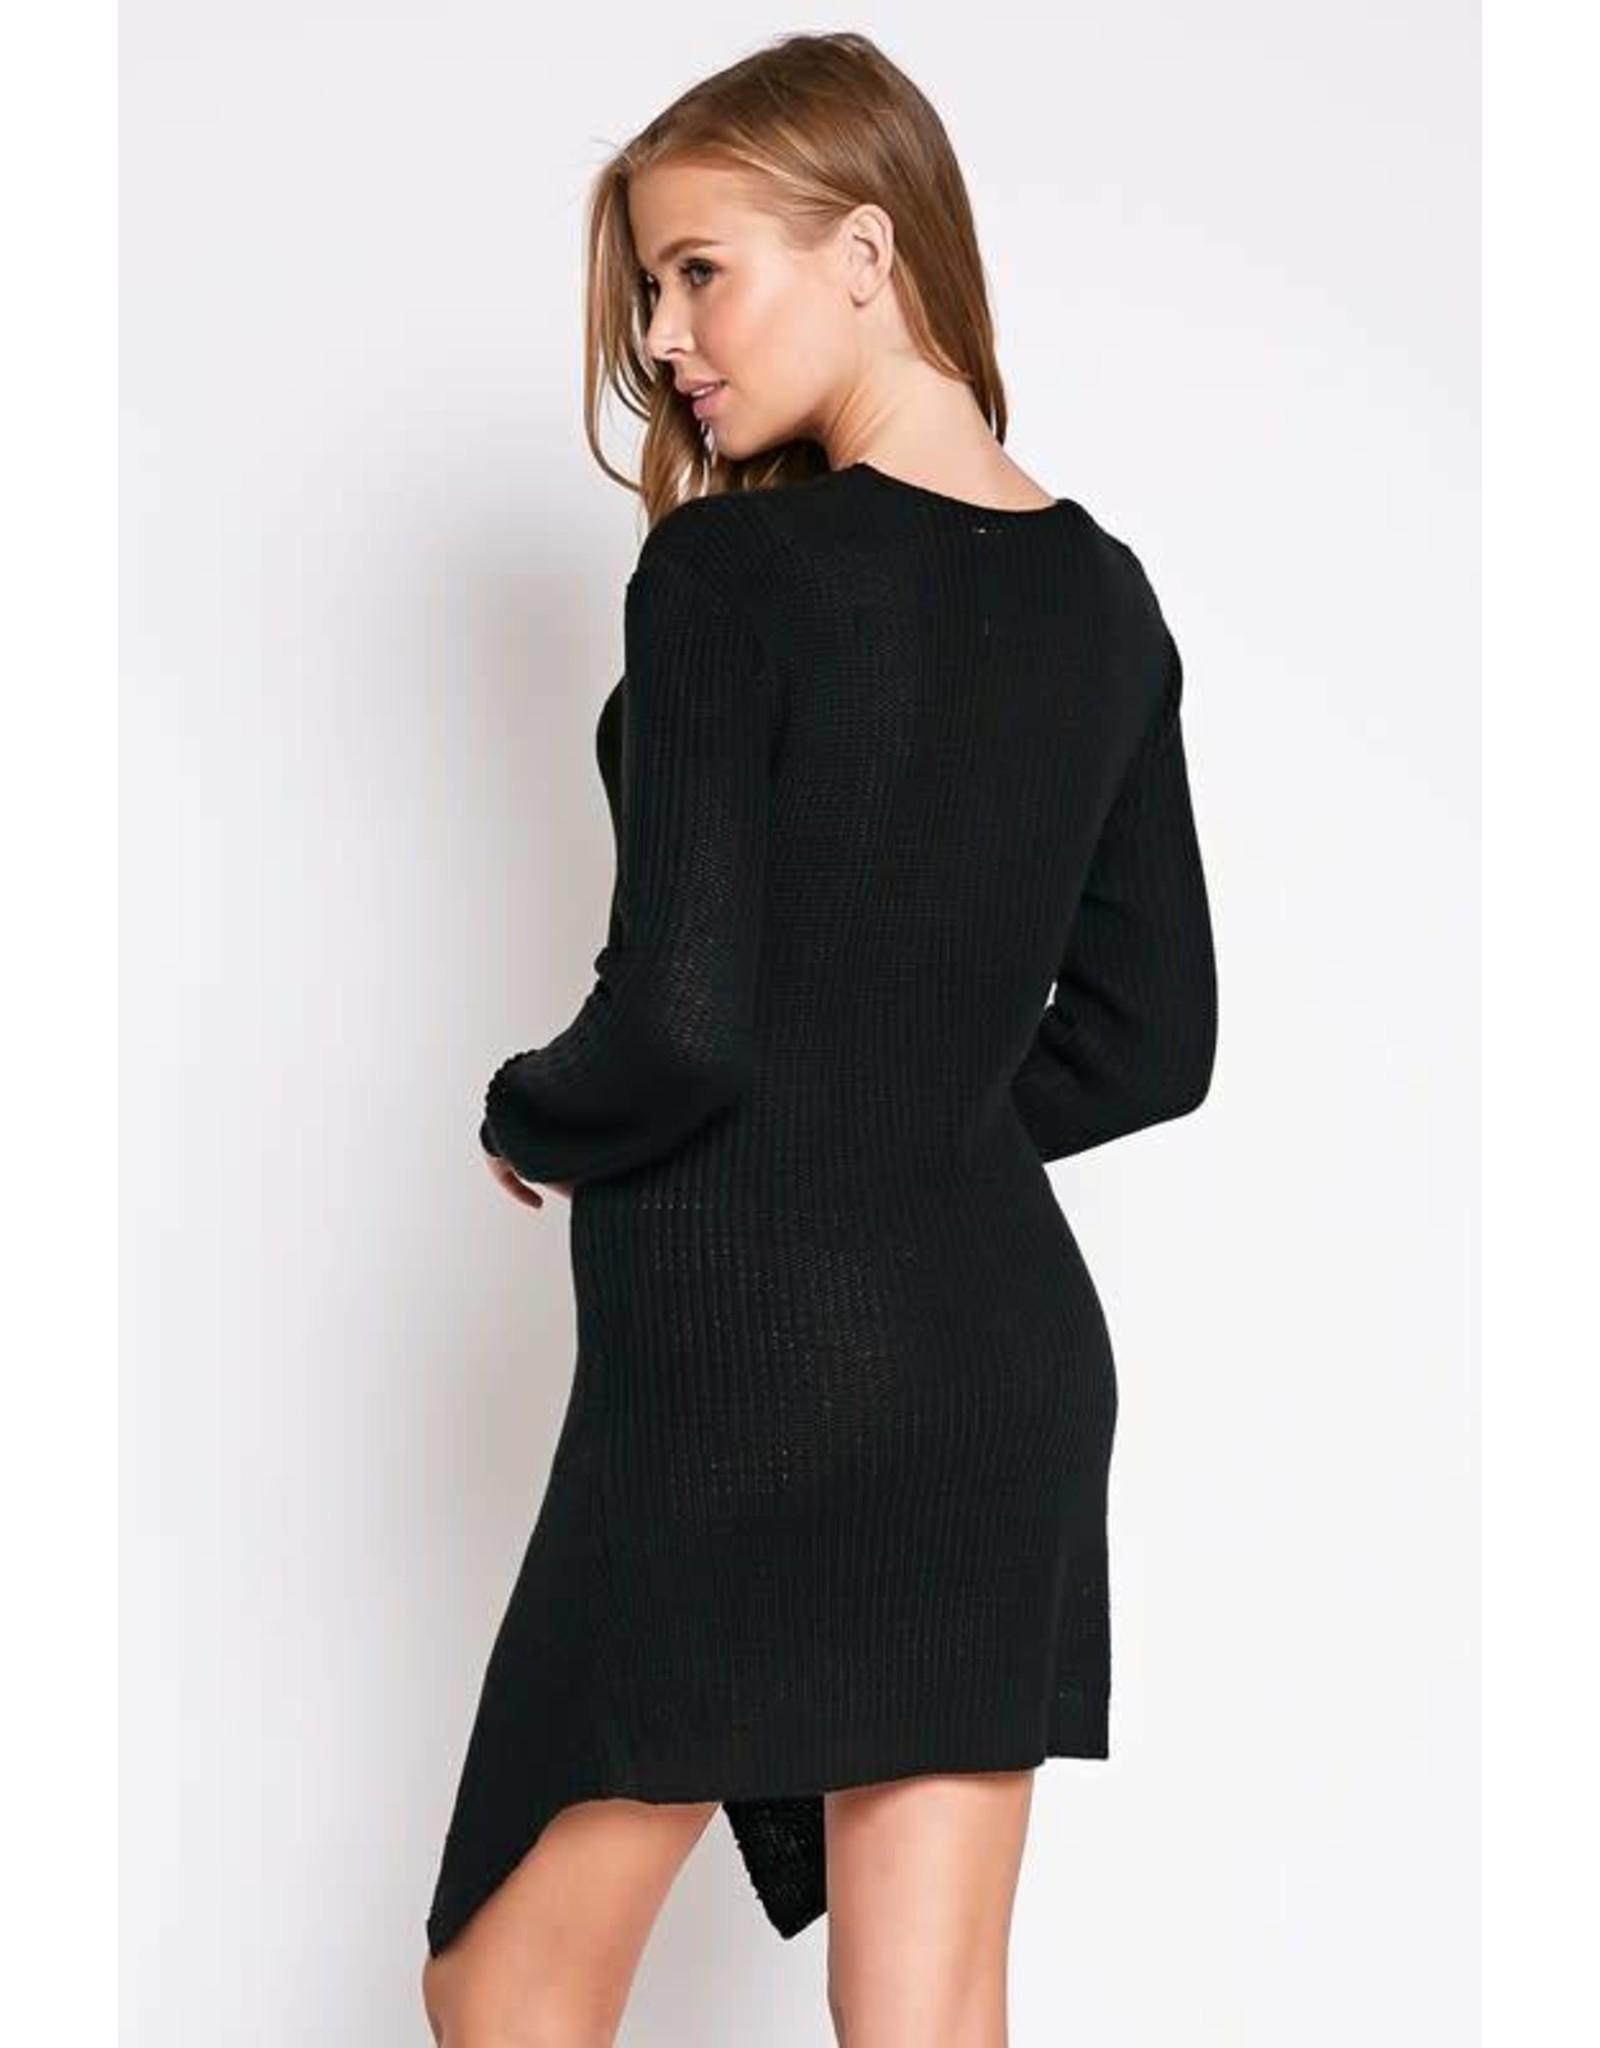 Keepin' It Chic Sweater Dress